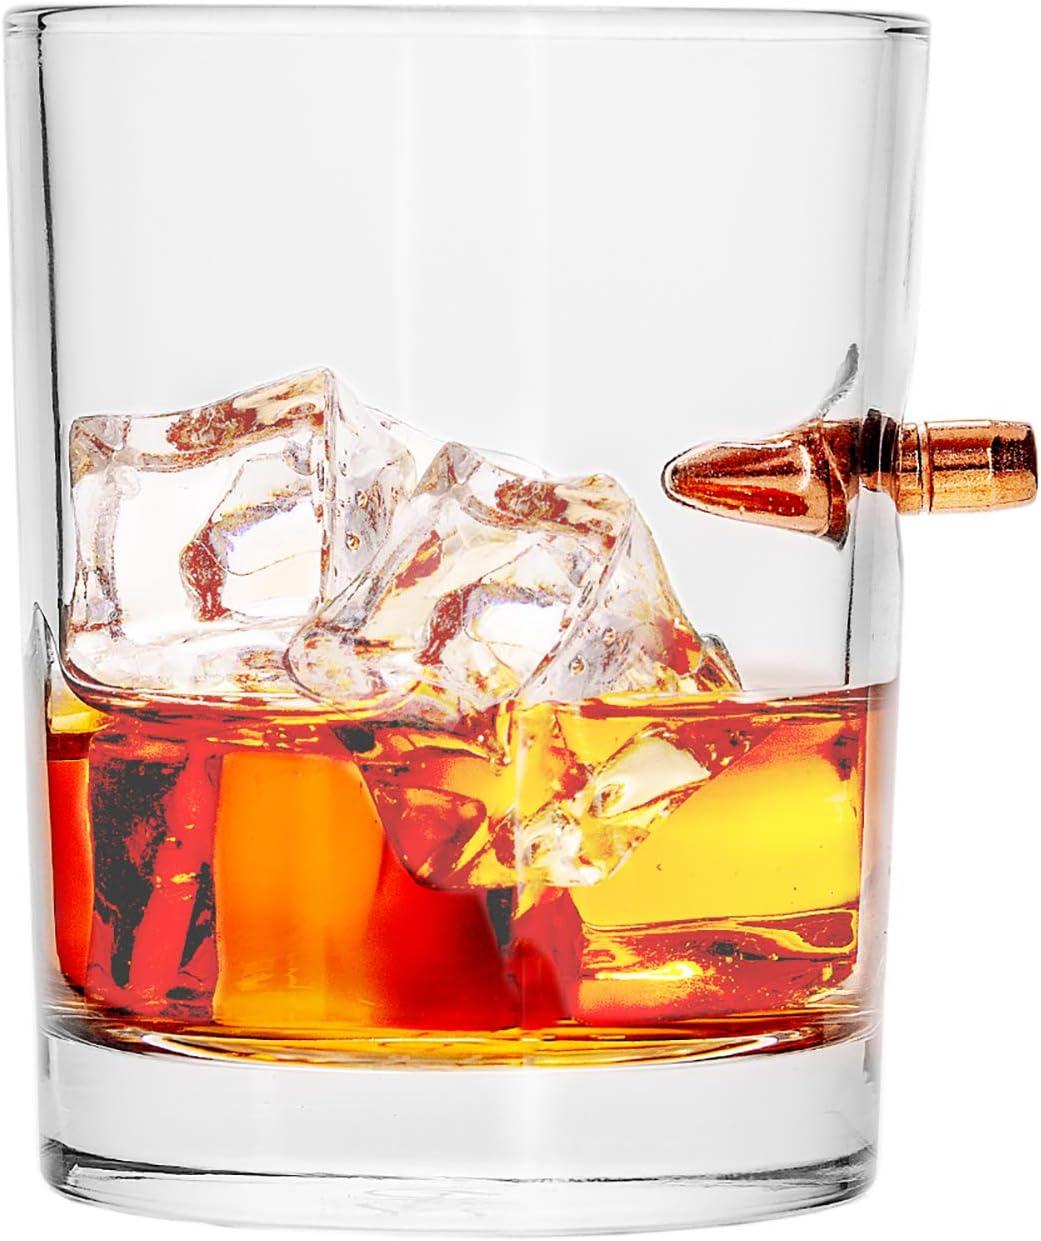 308 CALIBER WHISKEY GLASS Max 73% OFF Embedded OFFer Ro Bullet 10oz Borosilicate